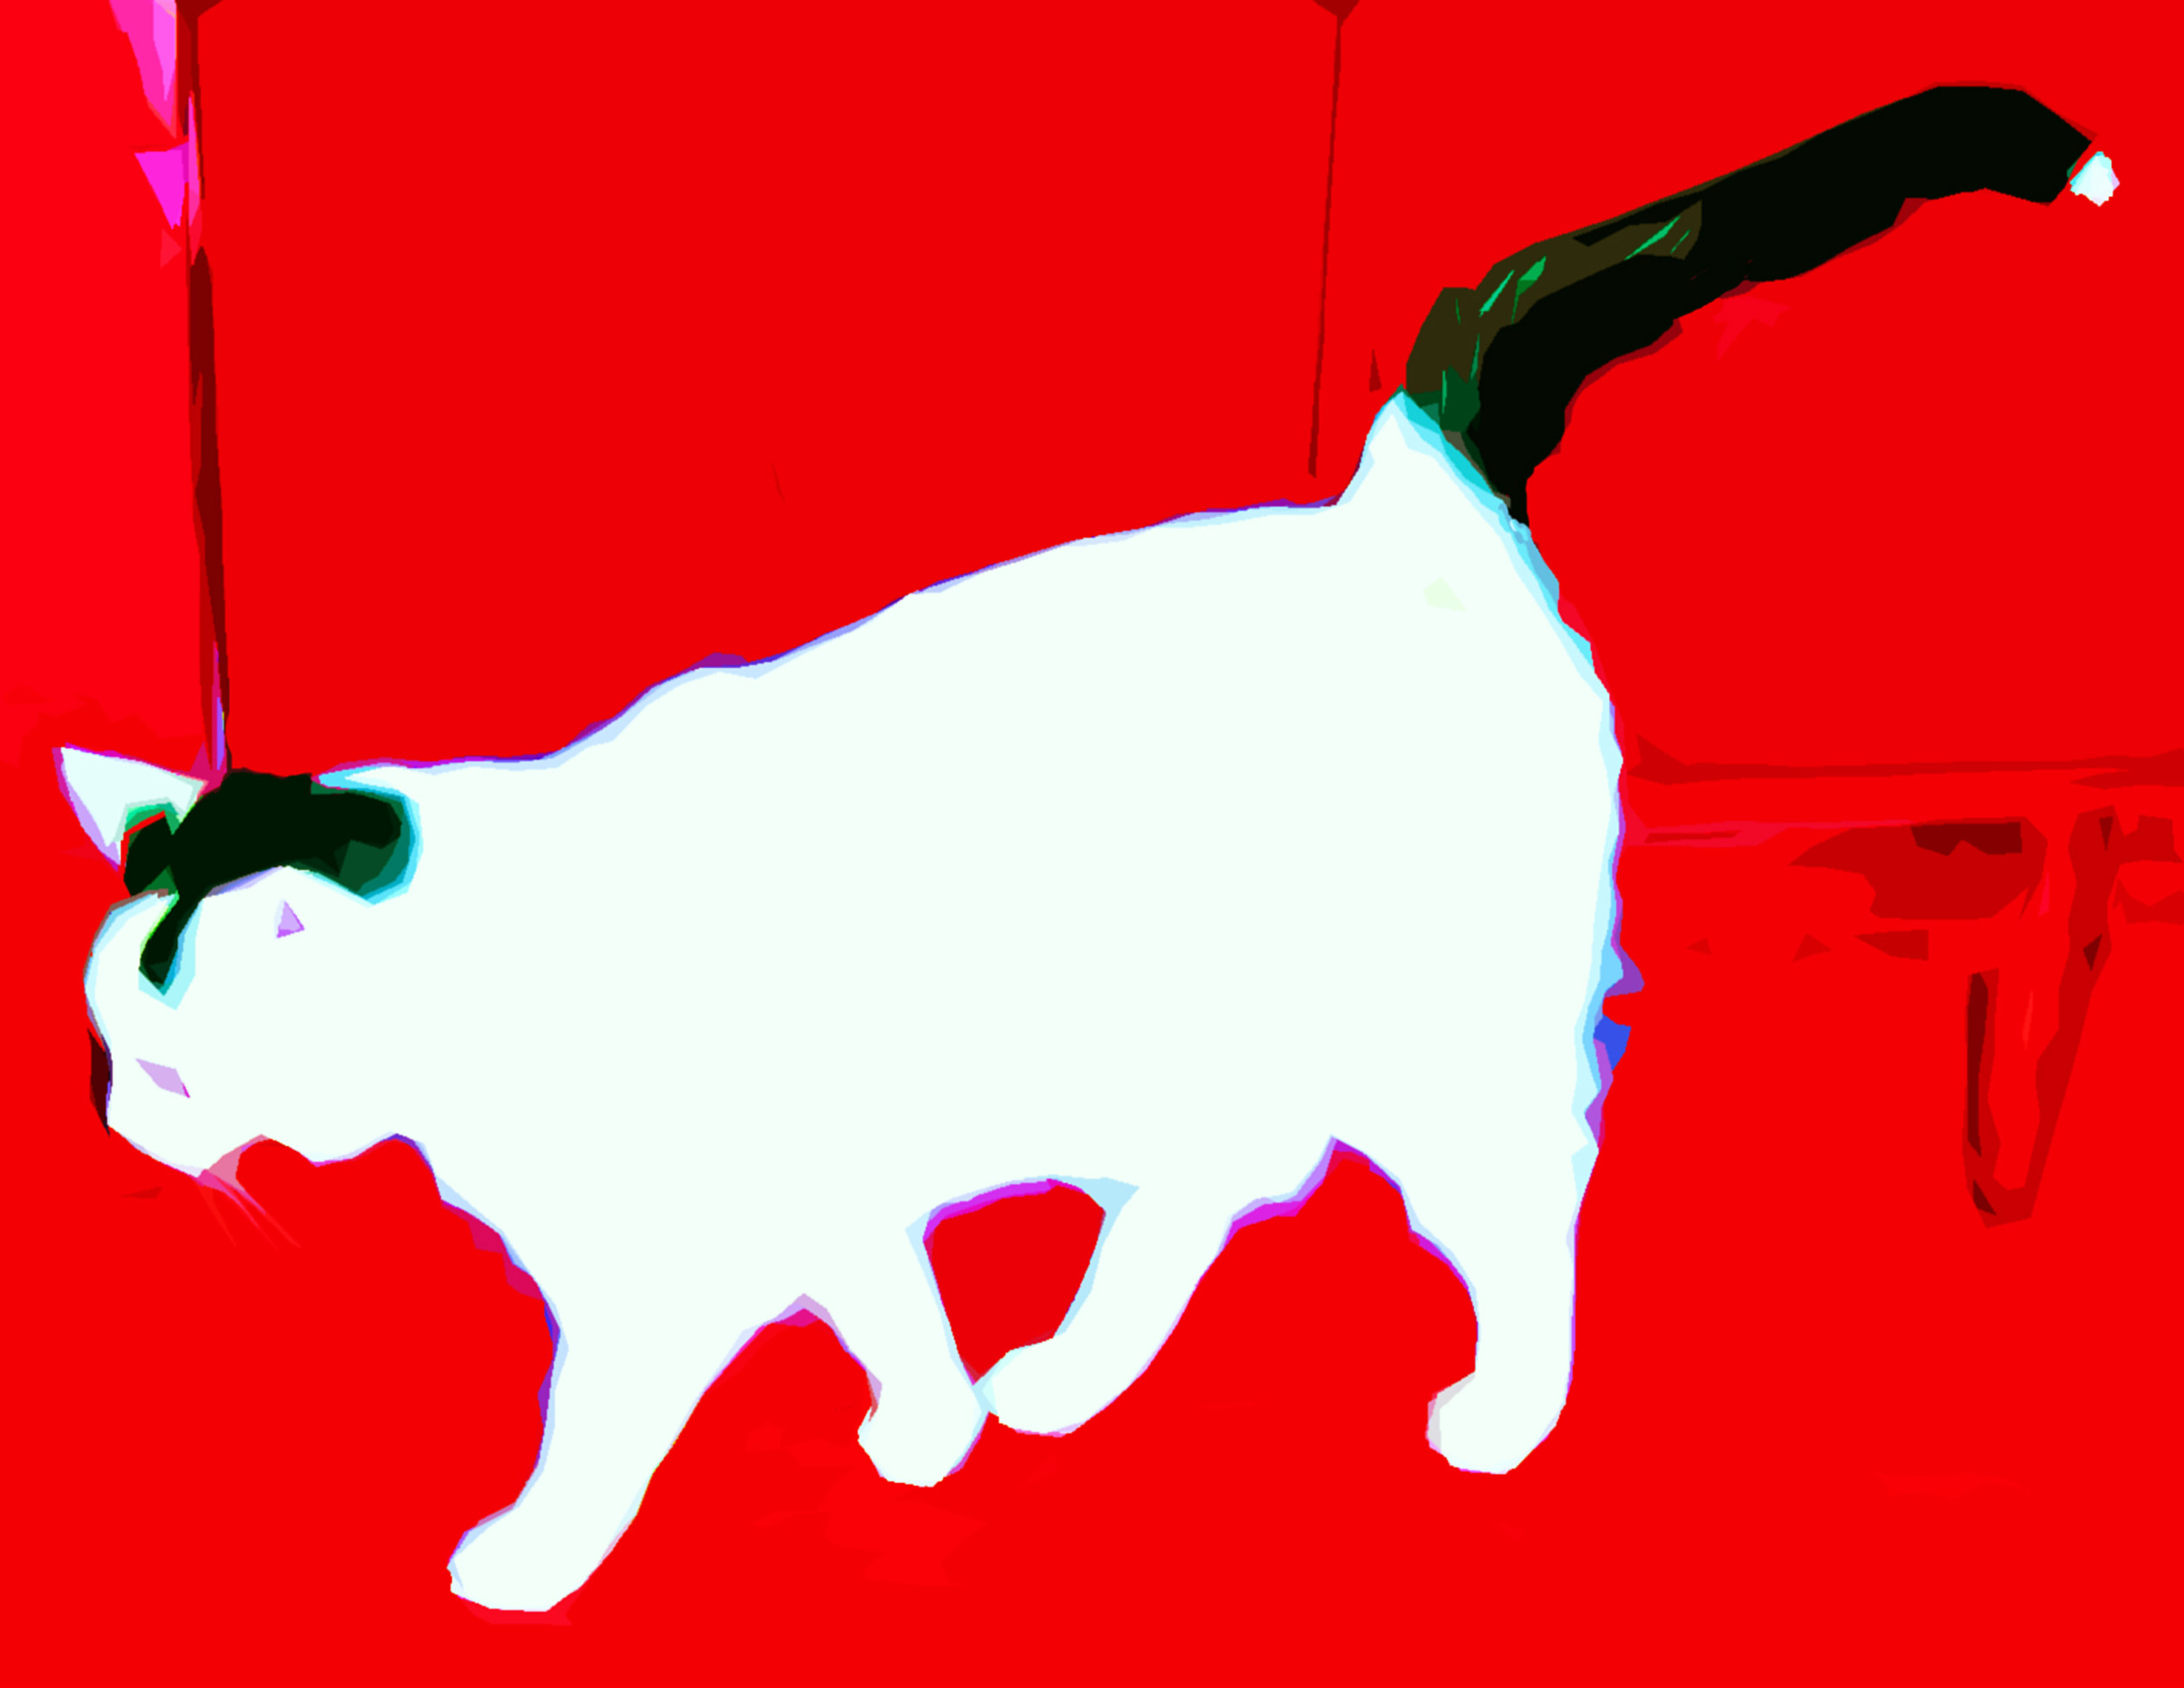 White and black Cat Custom Digital Fine Art Pet Portrait by Animal Artist BZTAT